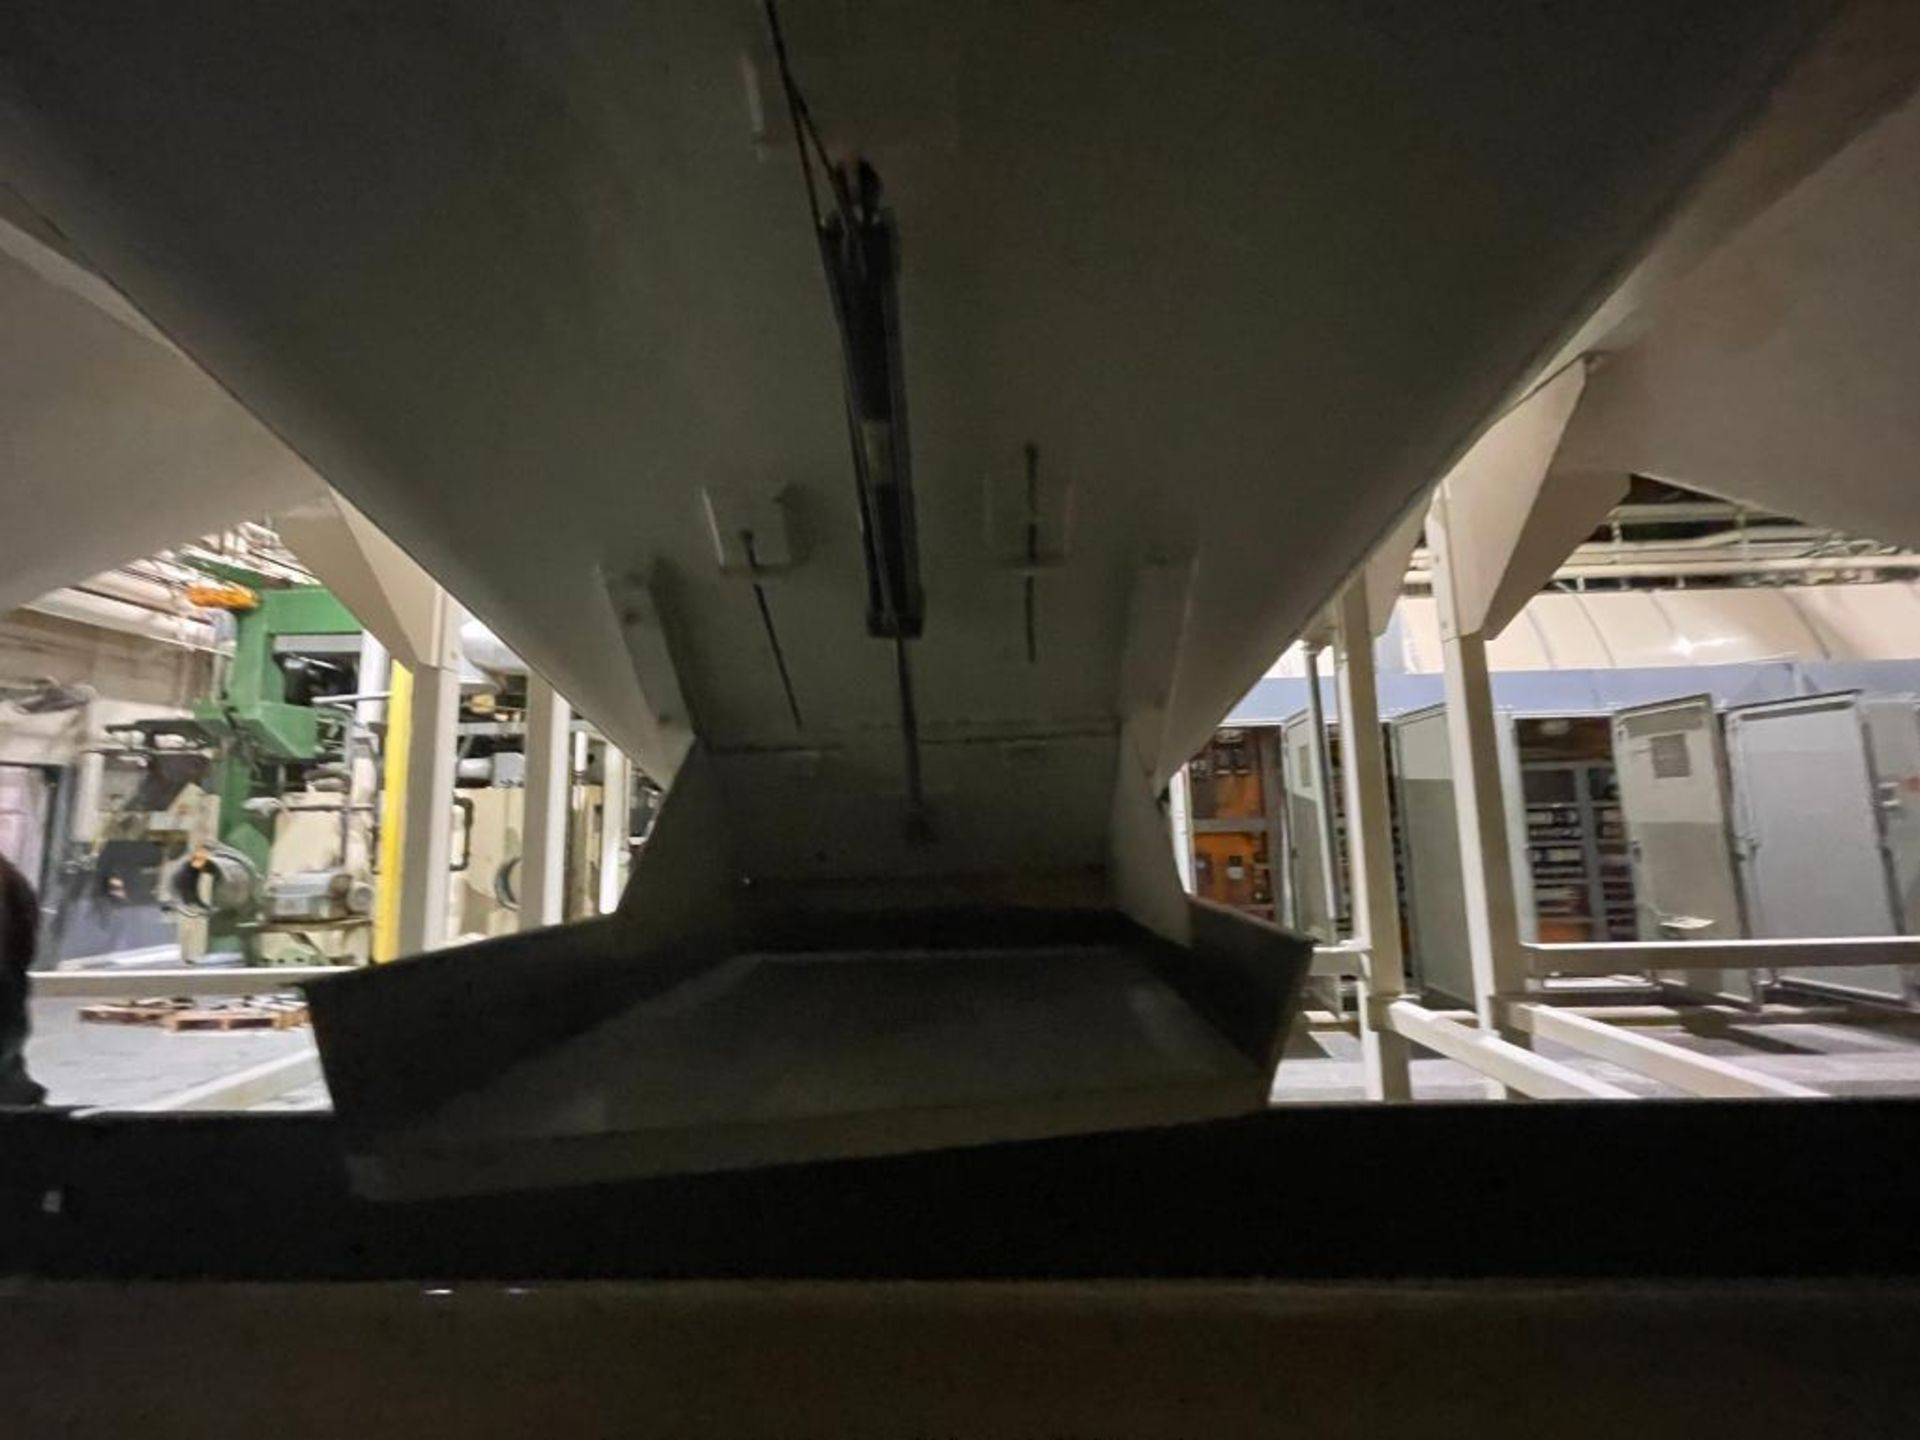 Aseeco mild steel cone bottom bulk storage bin - Image 18 of 31